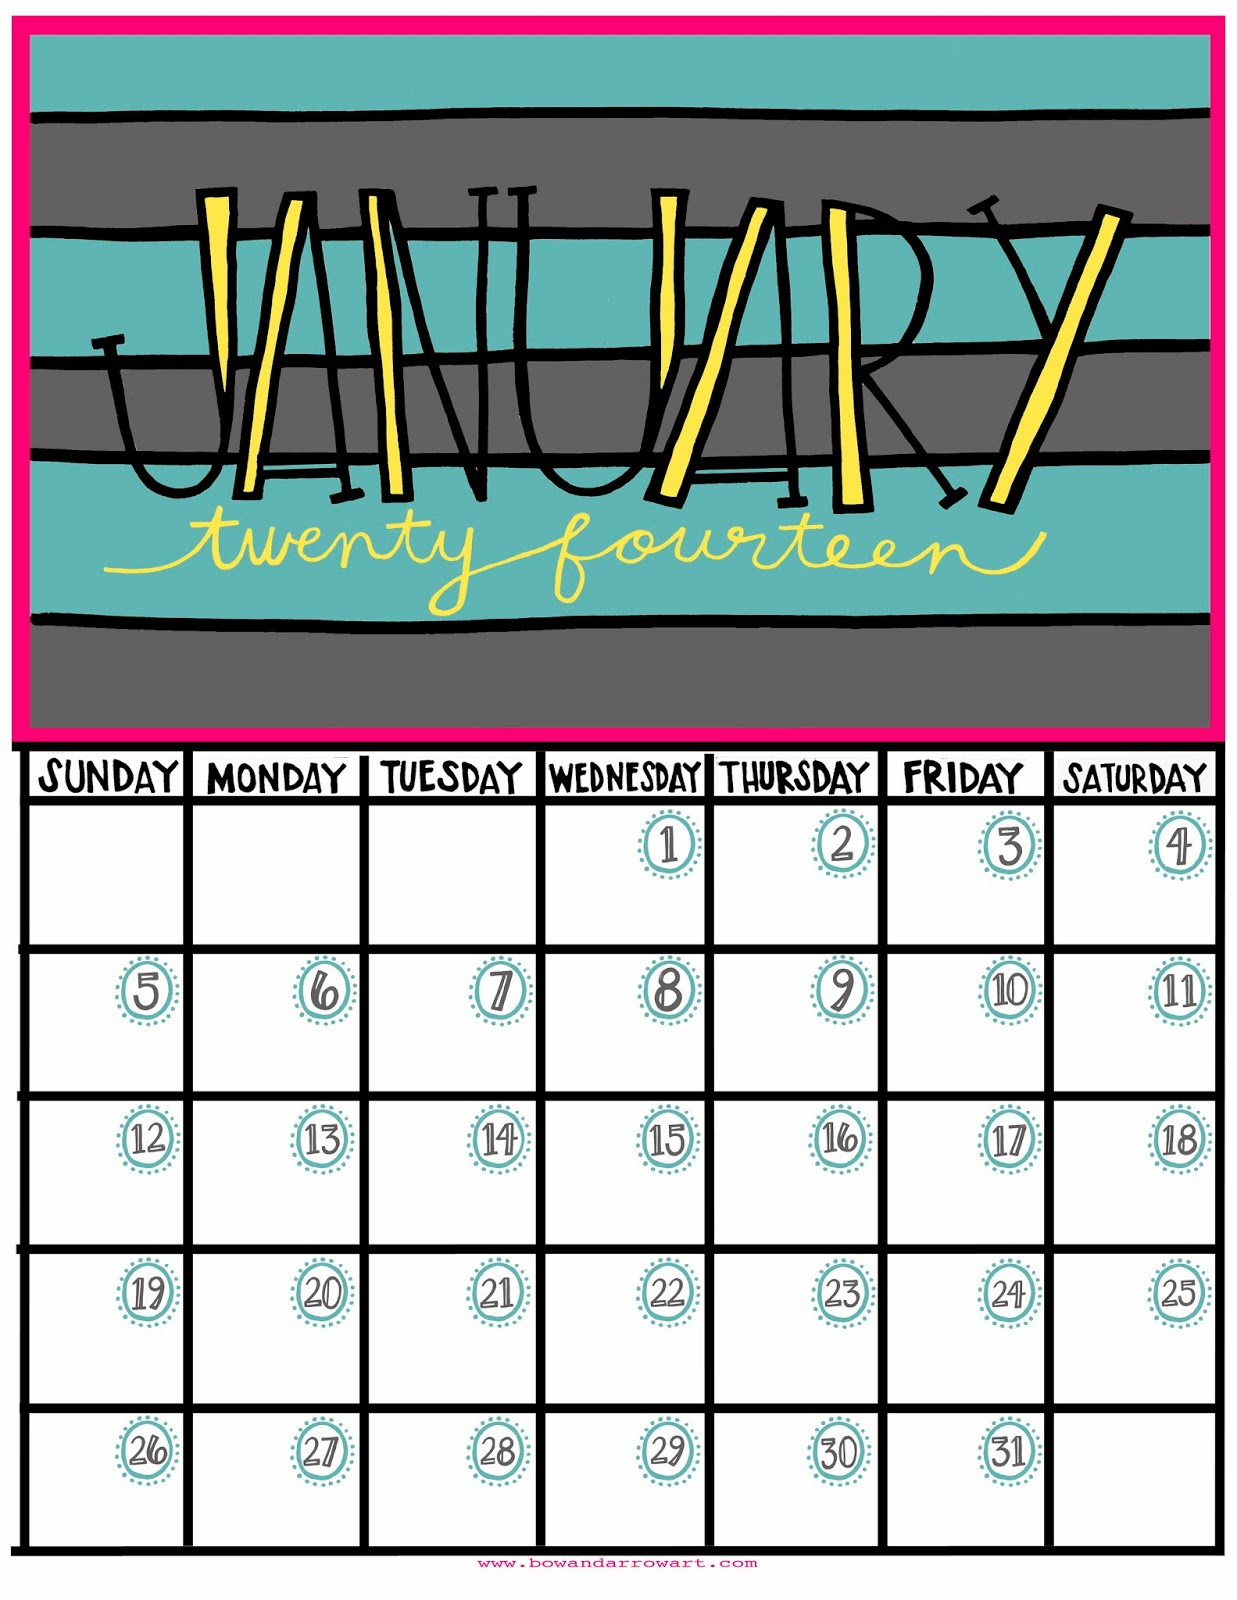 Month Of January 2014 Printable Calendar January  printable calendarJanuary 2014 Calendar Printable Portrait